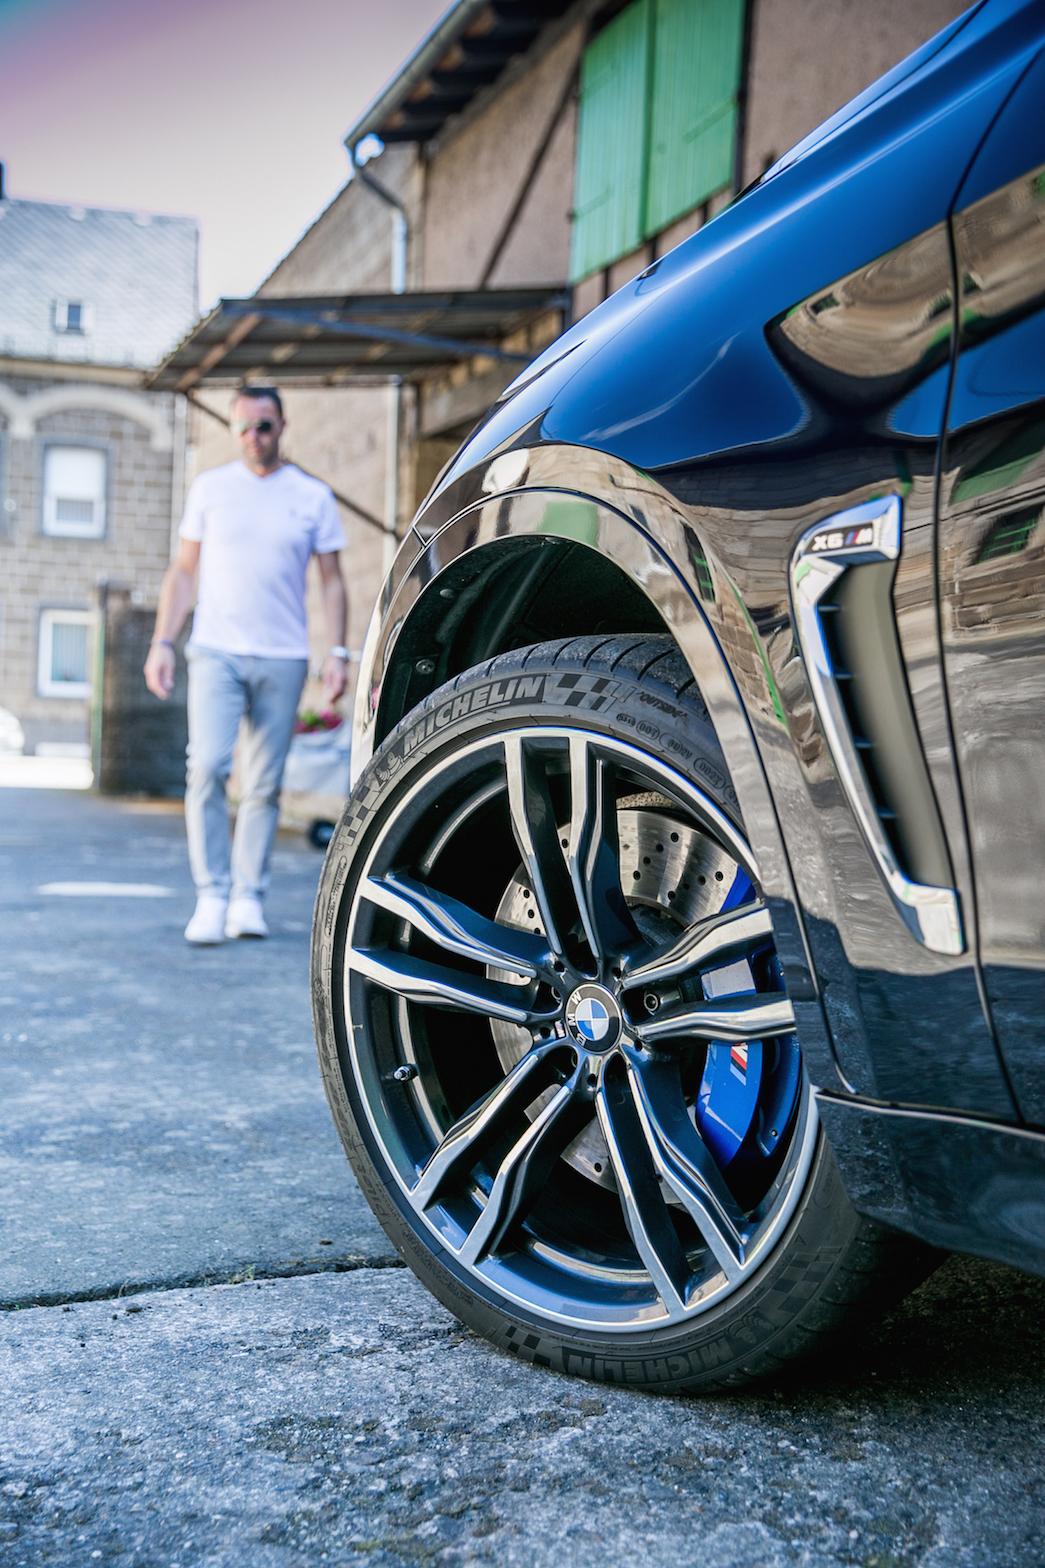 Pure Freude am Fahren mit 575 PS im BMW X6 M MPower MGmbH Motorsport BMWAG XDrive DriveLogic Sports Activity Coupé Testdrive Testfahrt PepperAndGold Dirk